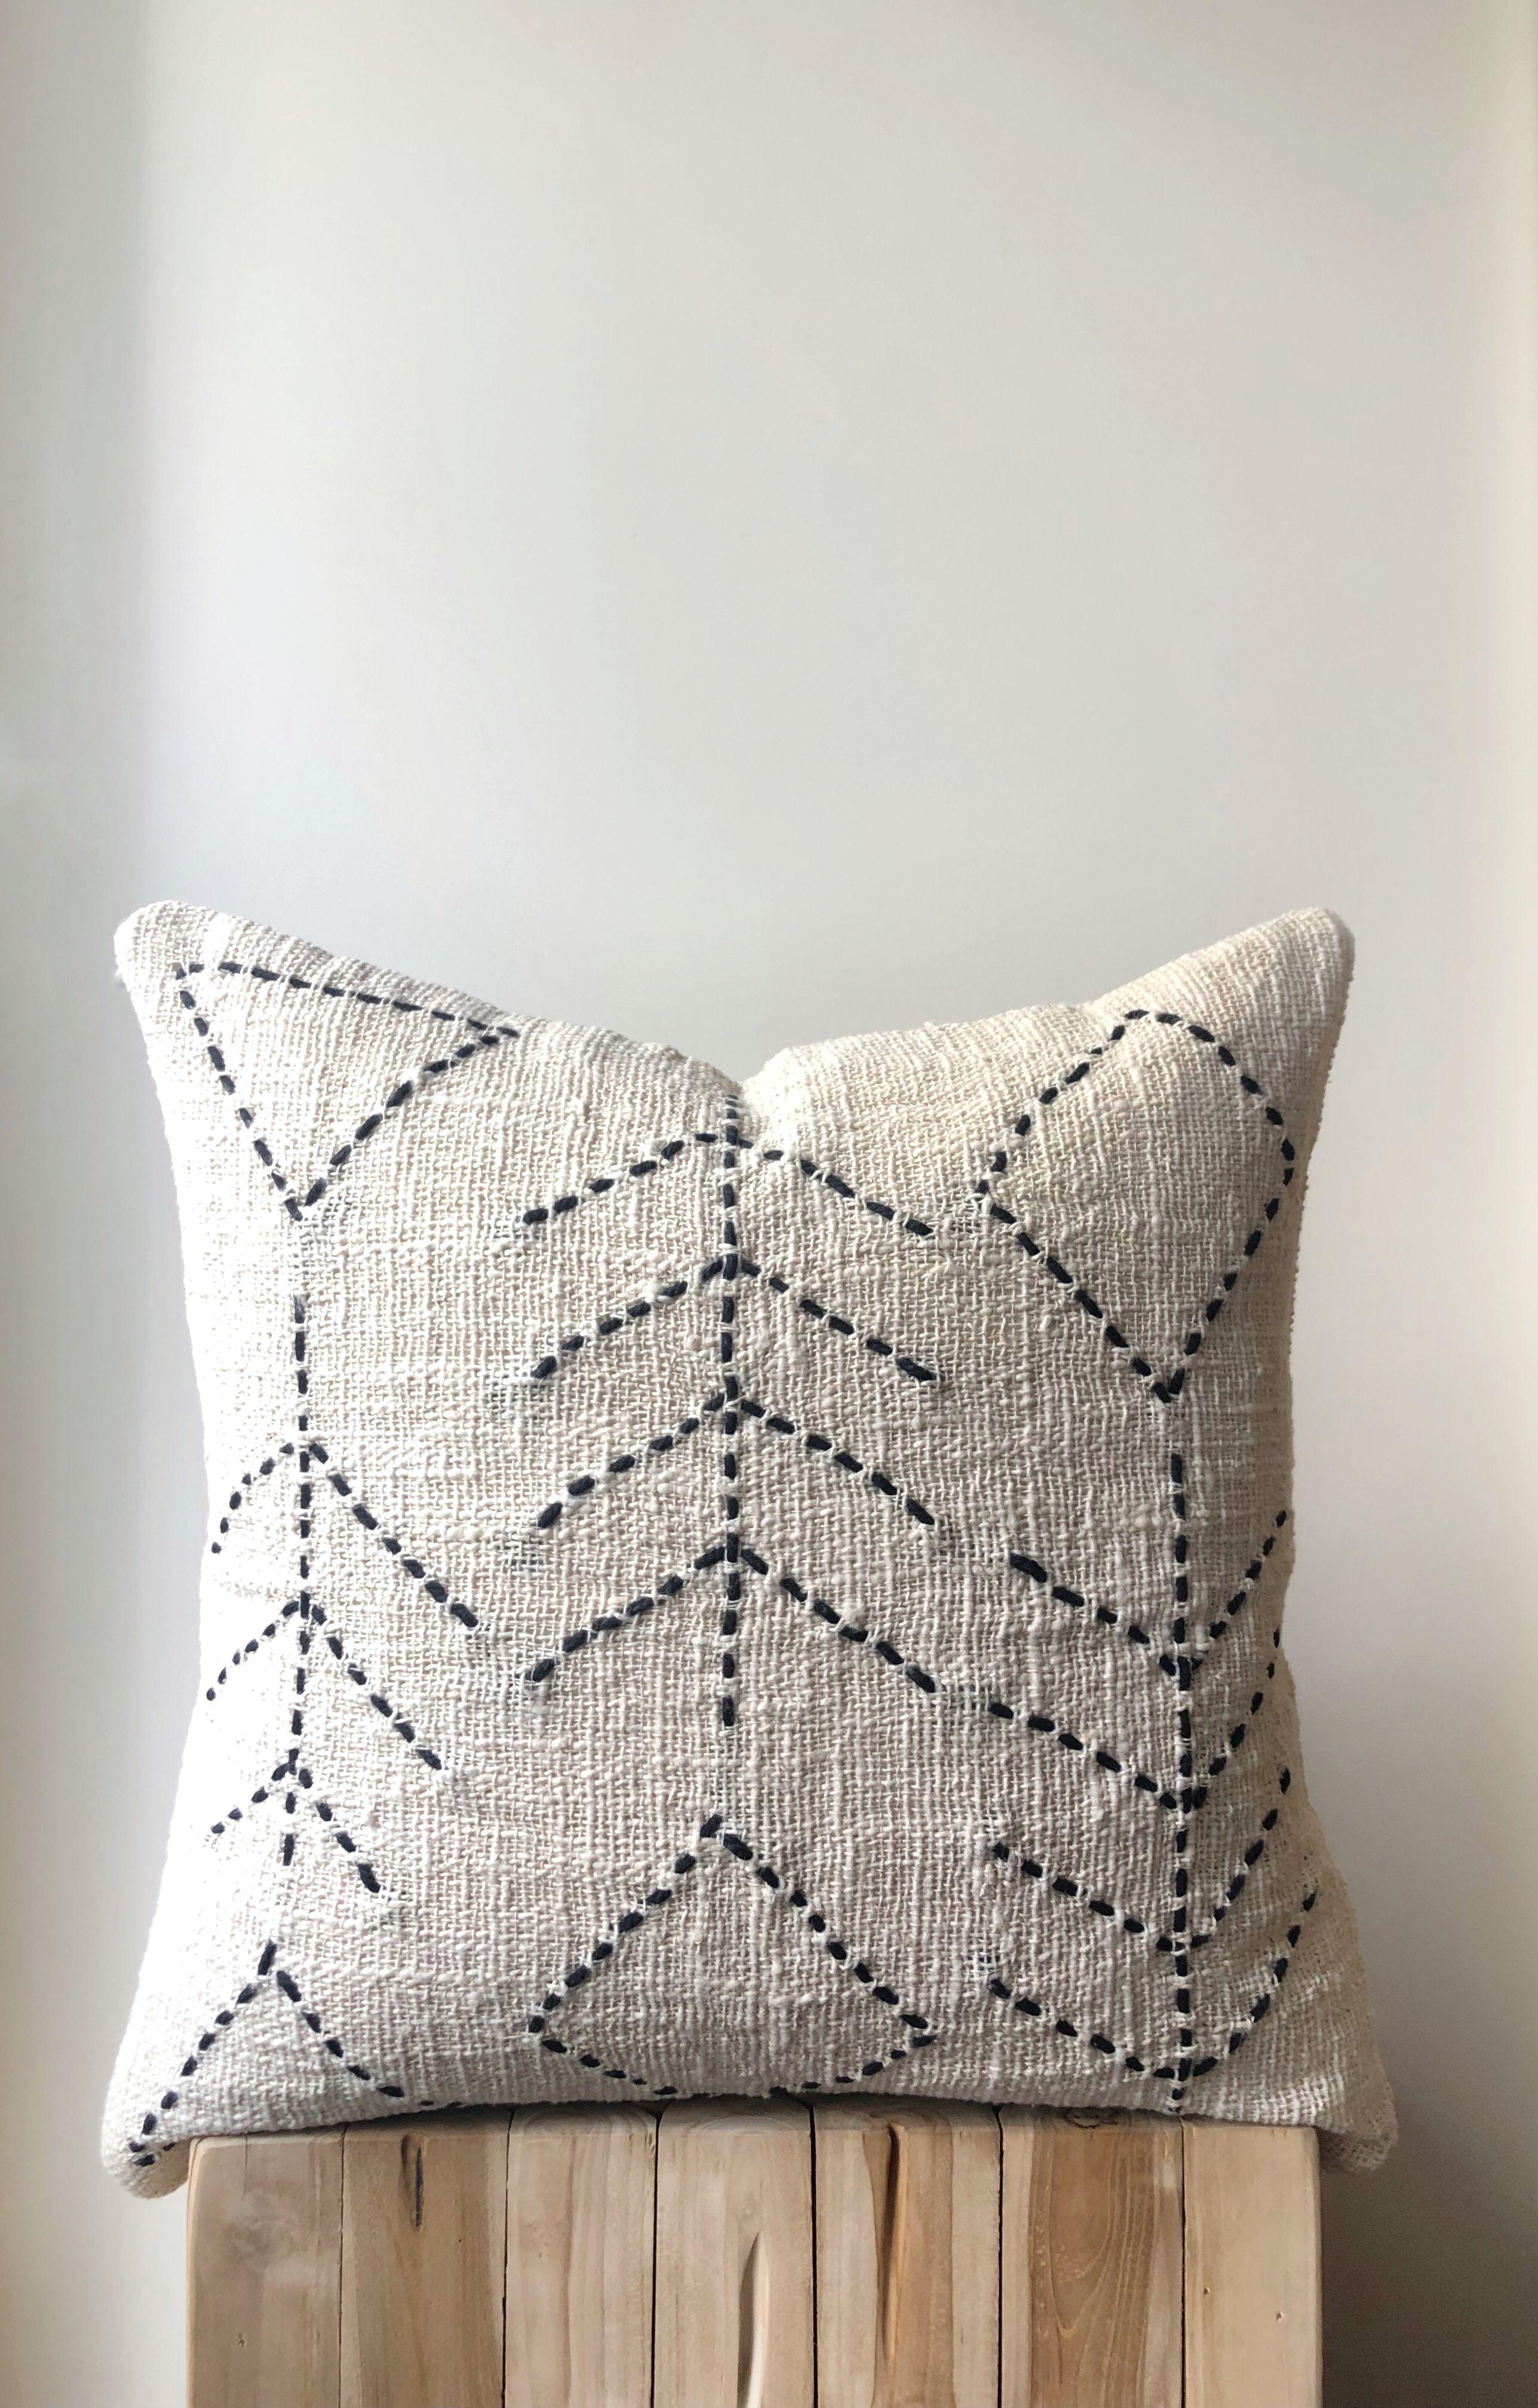 Natural Boho Raw Cotton Pillow Organic Cream Neutral Colour With Black Stitched Leaf Print 50x50 20 Australia Cushions Home Decor Decoration Salon Coussin